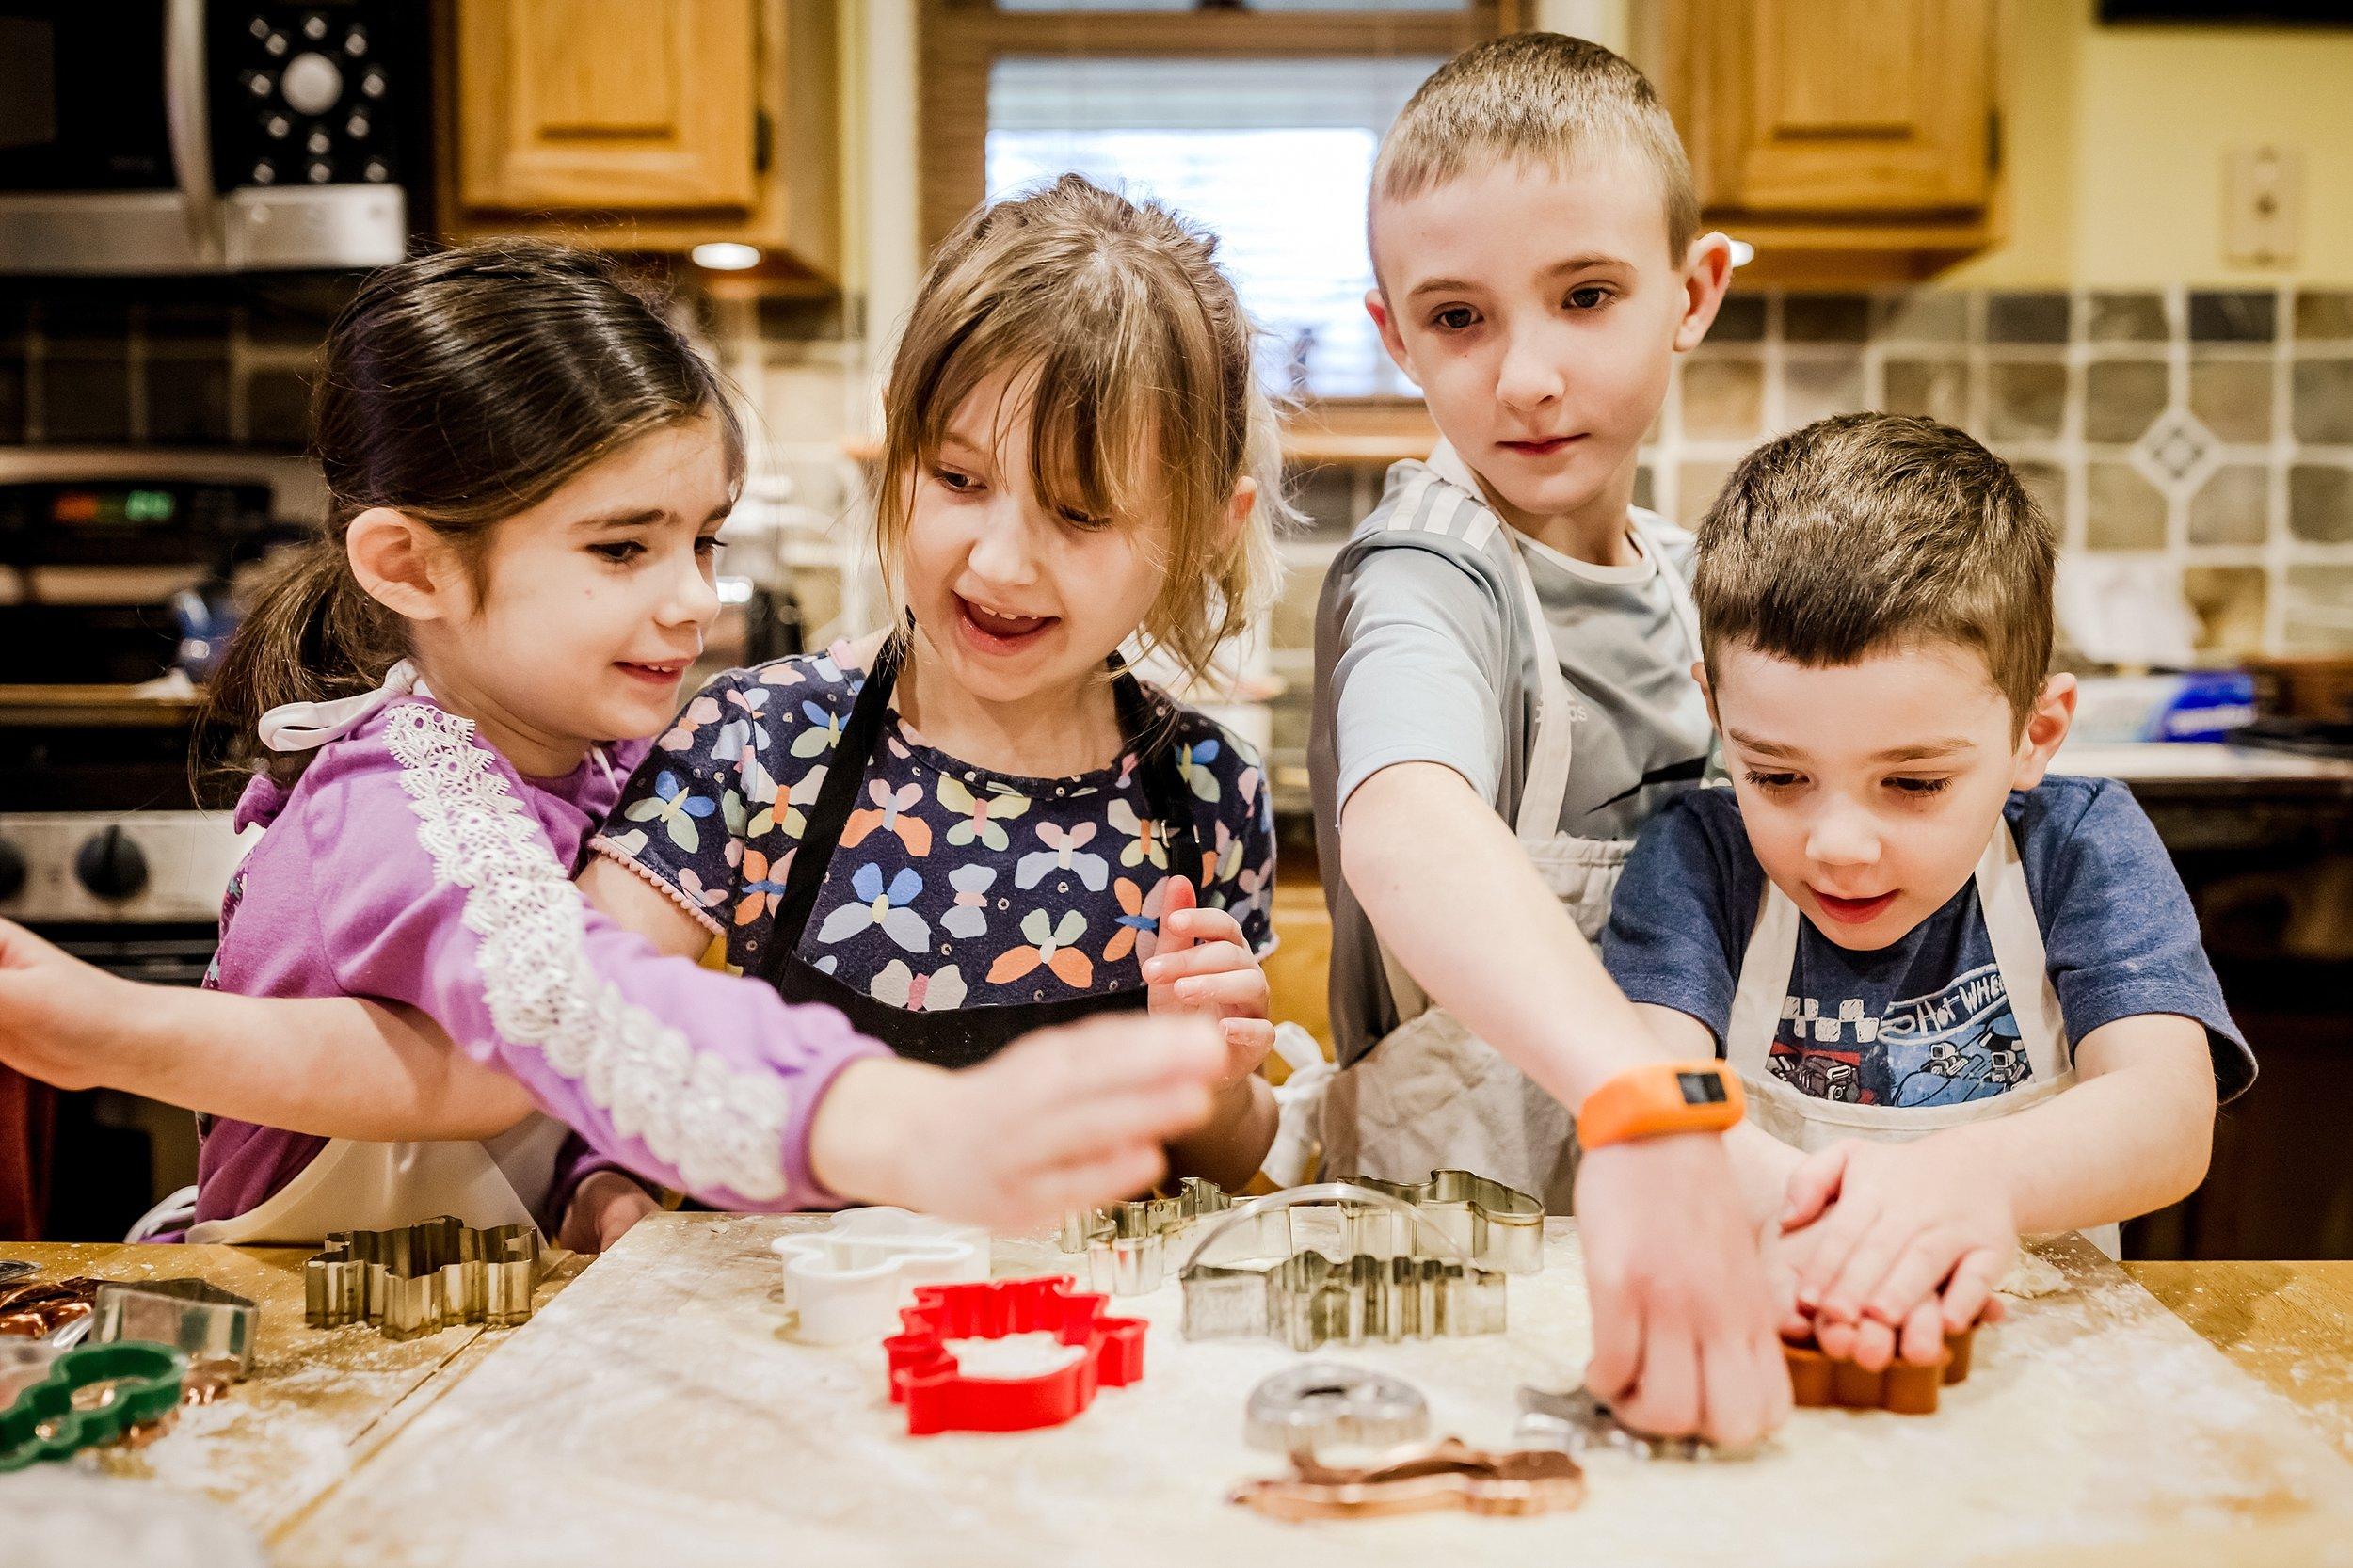 Lehigh-Valley-In-Home-Family-Photographer_0002.jpg